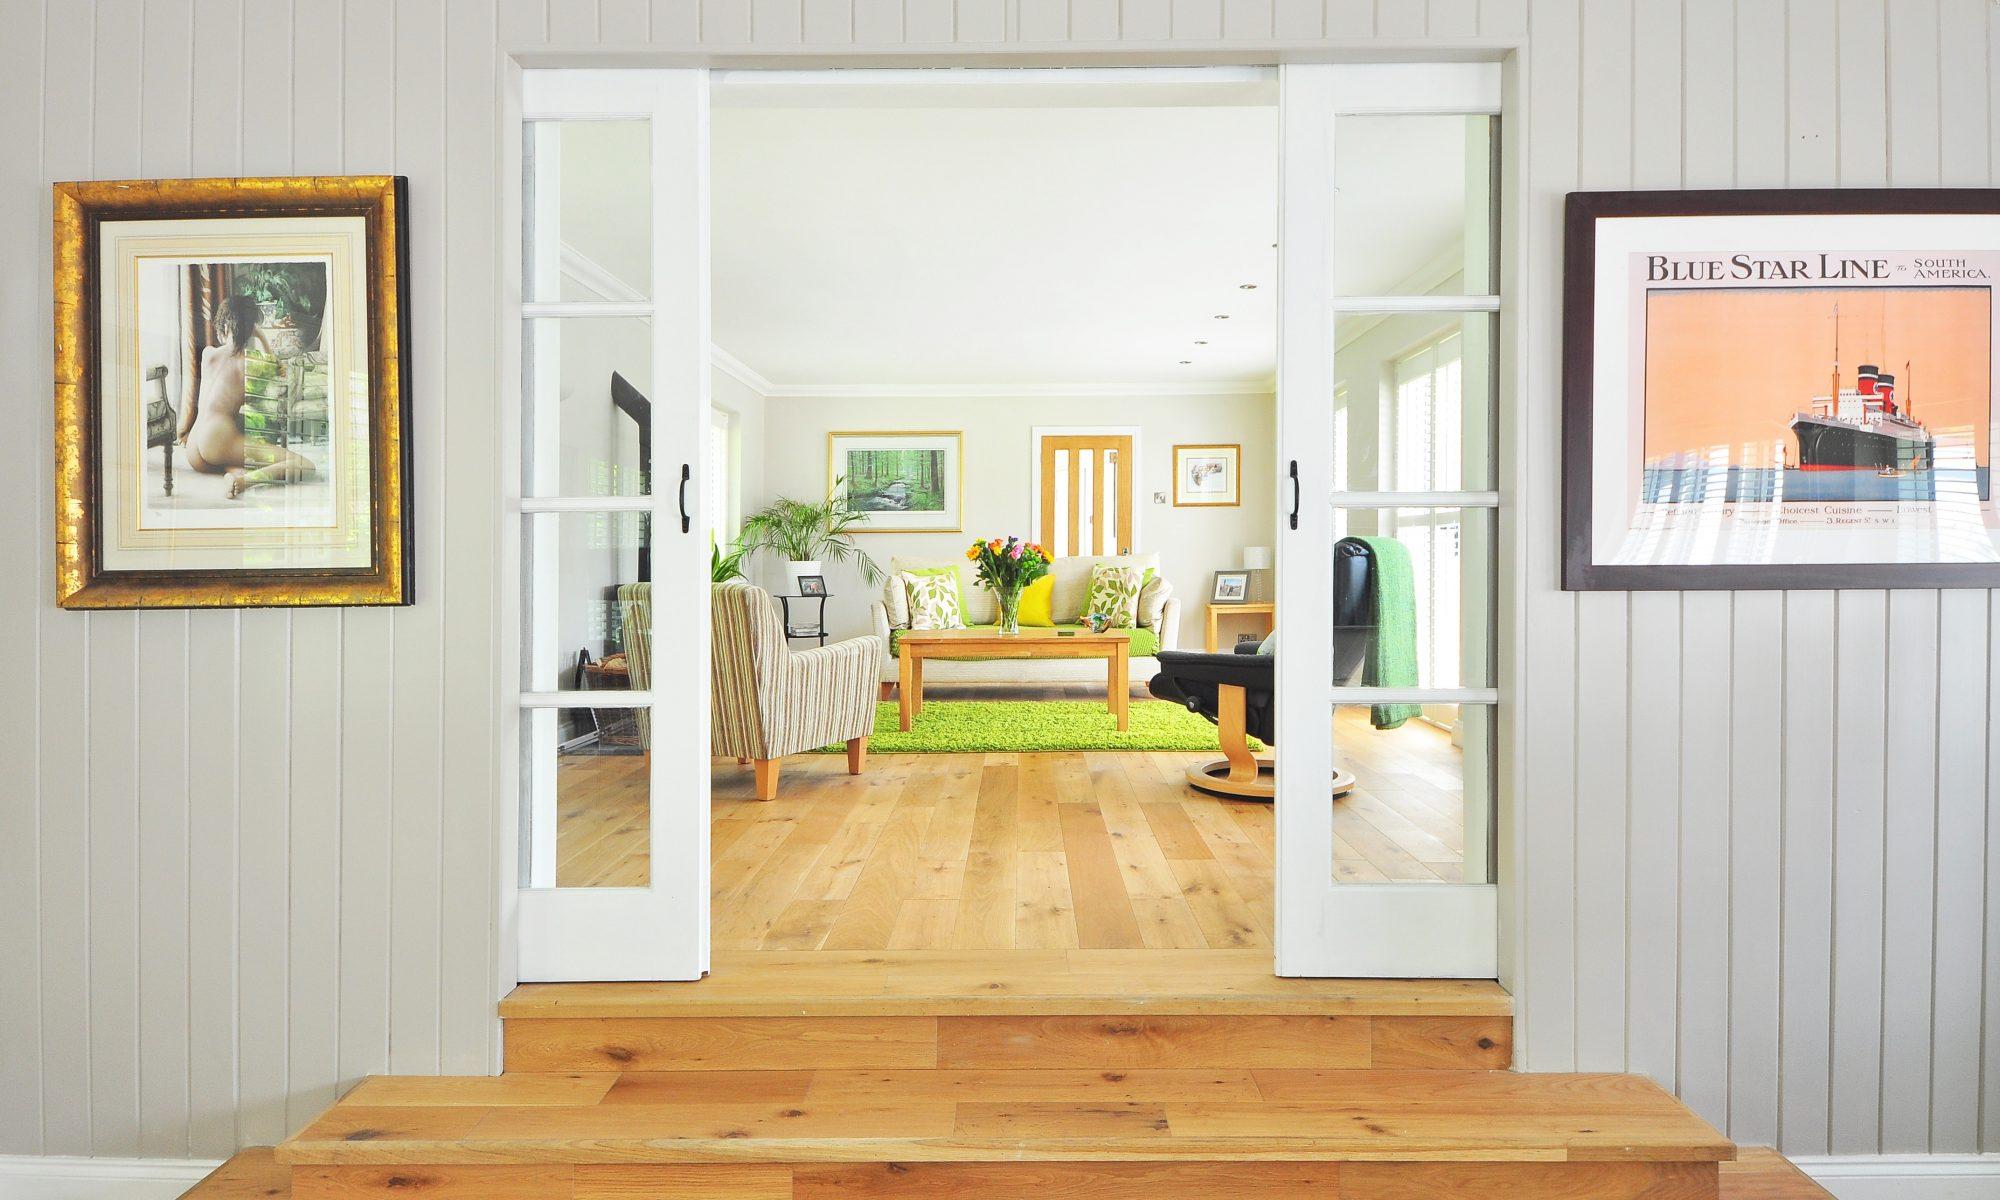 Home extension, improvement, refurbishment